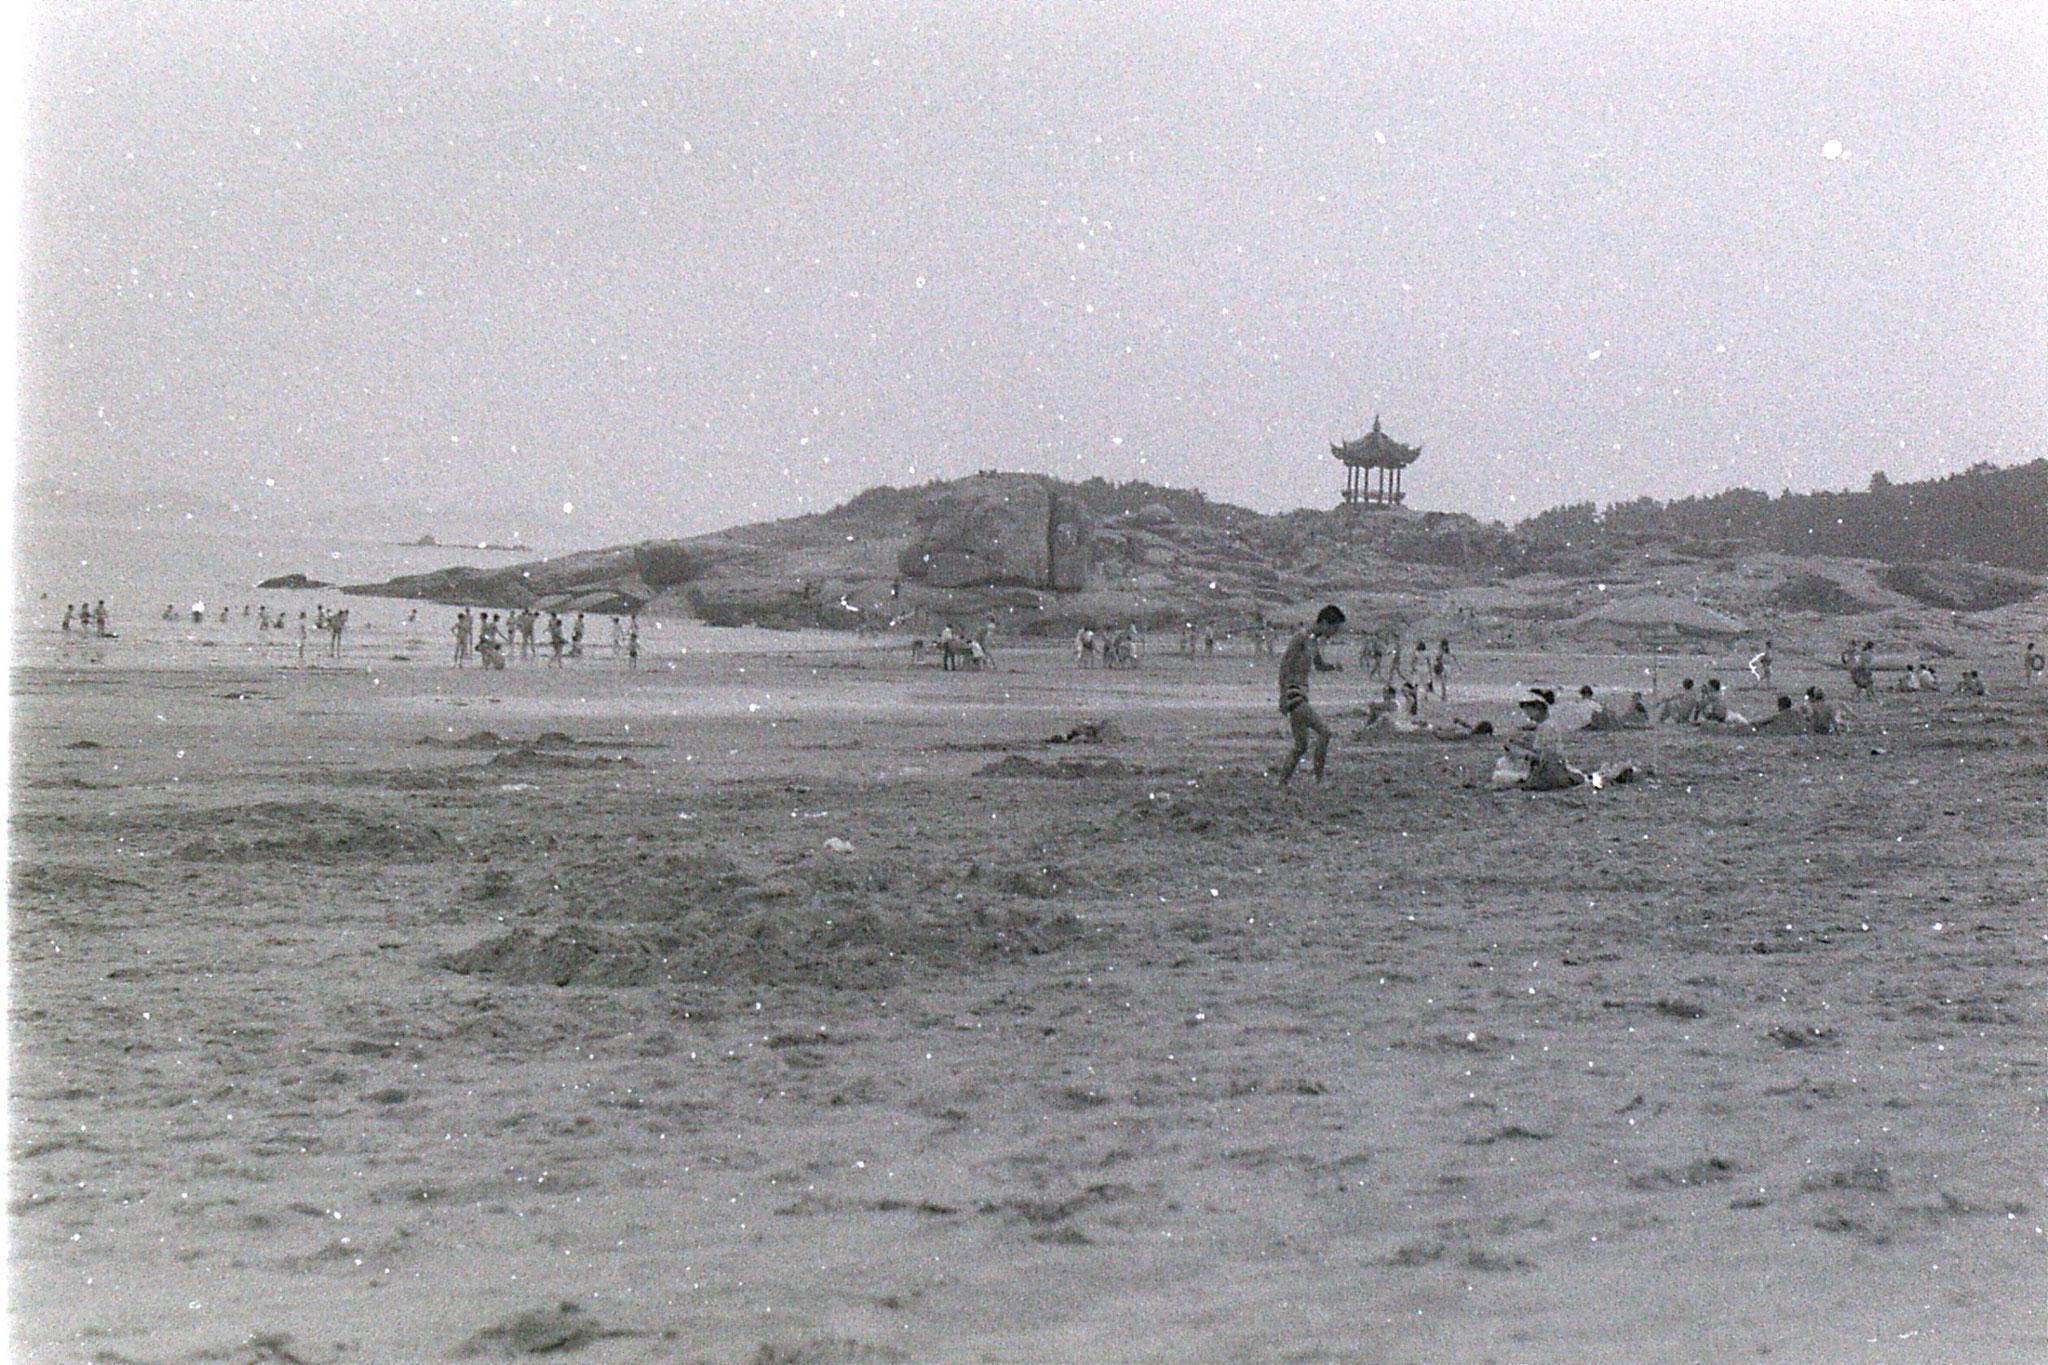 24/7/1989: 9: Putuo 100 pace beach